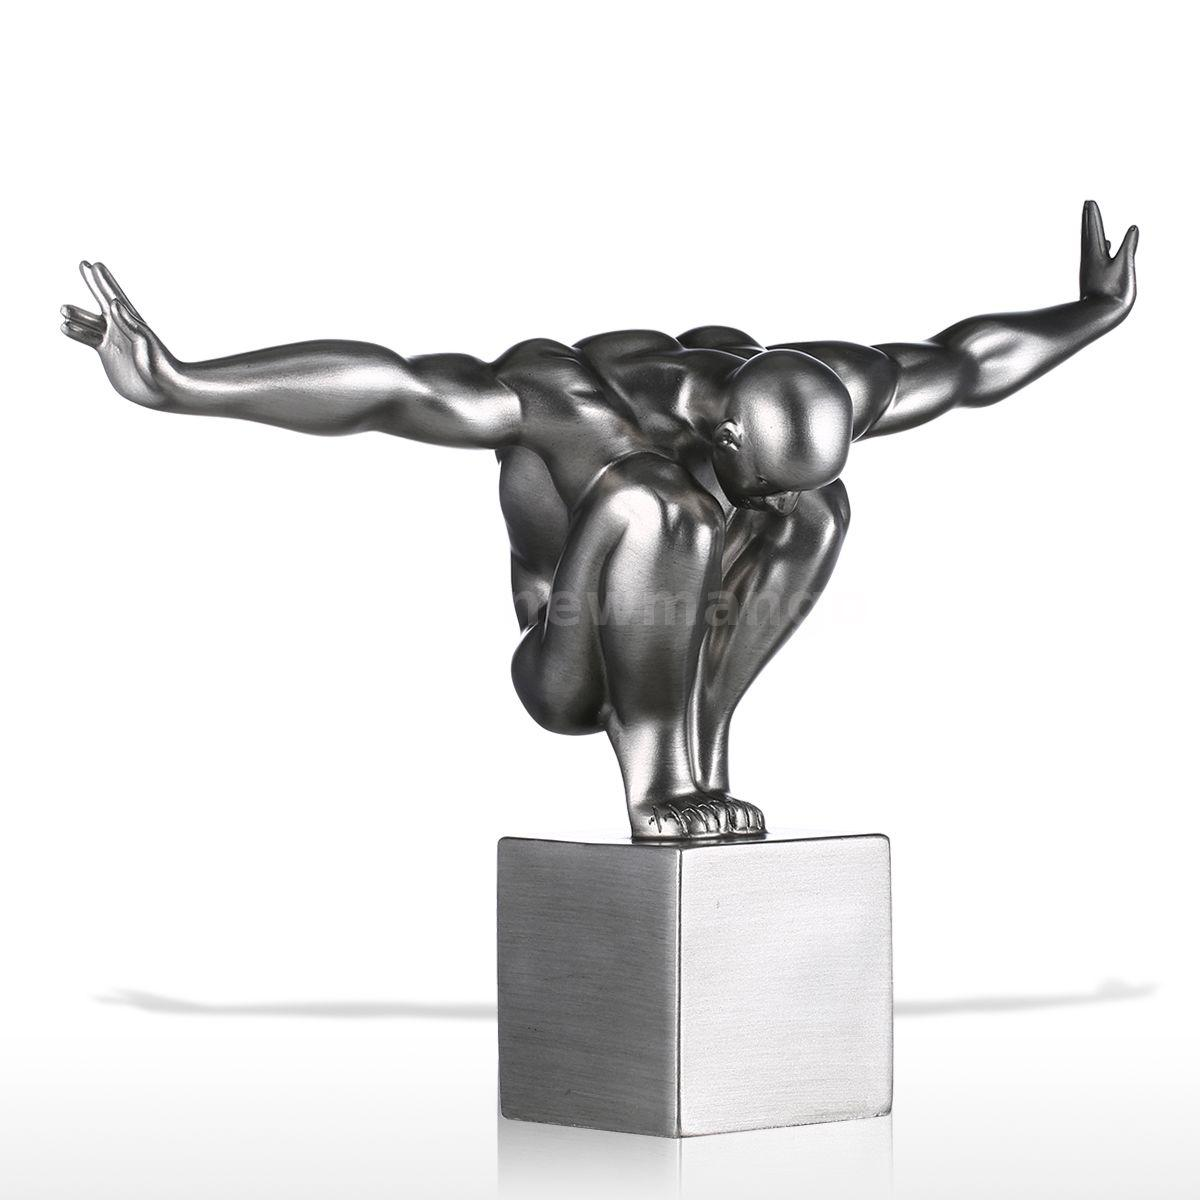 Gifts tooarts diver fiberglass modern sculpture home decor diving ebay - Statue deco moderne ...